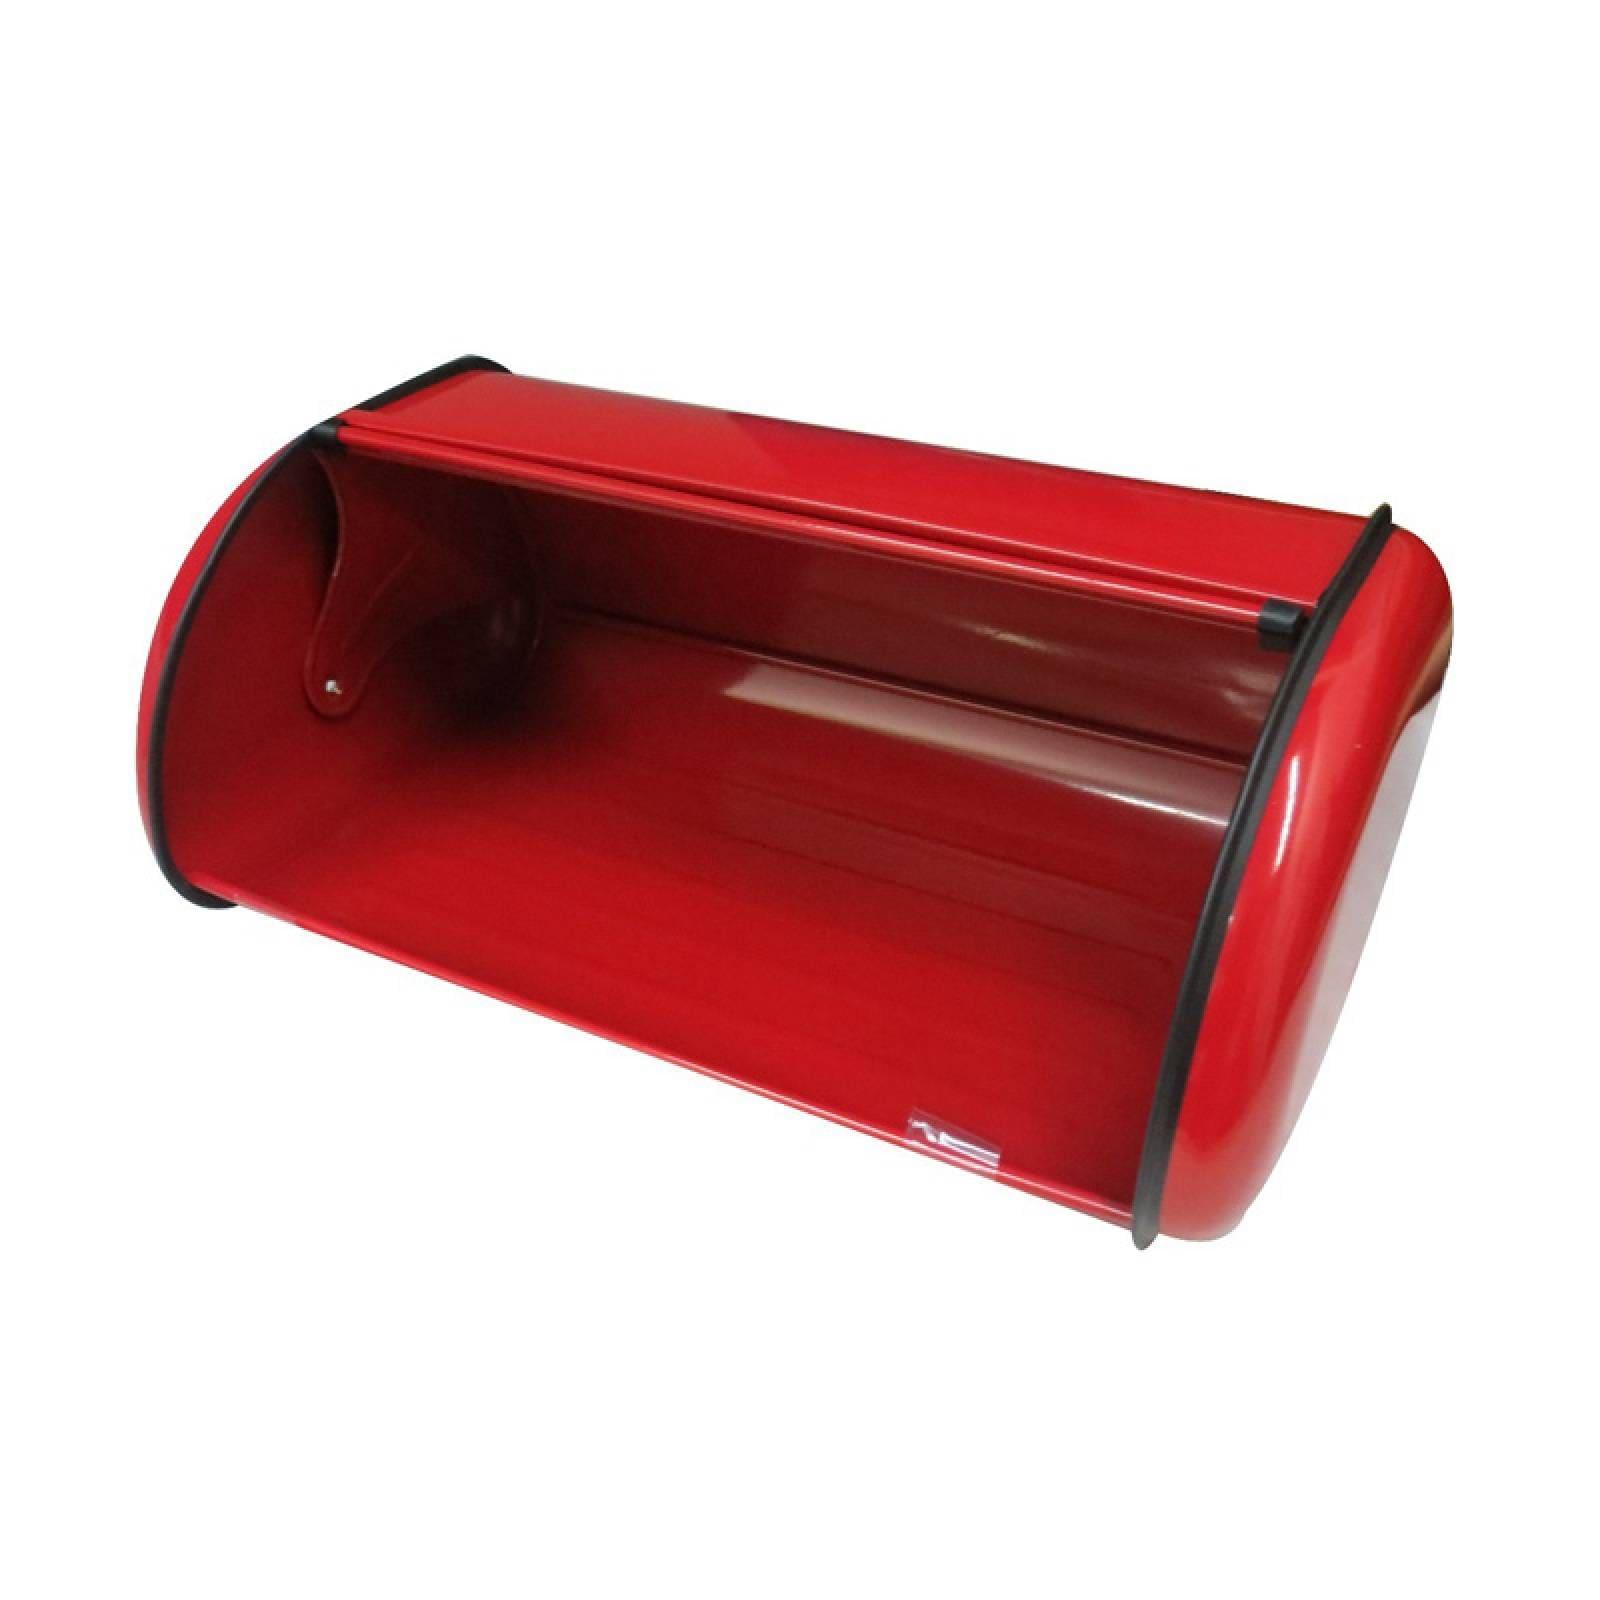 Panera De Acero Inoxidable Color Rojo 46X19X20 Cm Brandgap